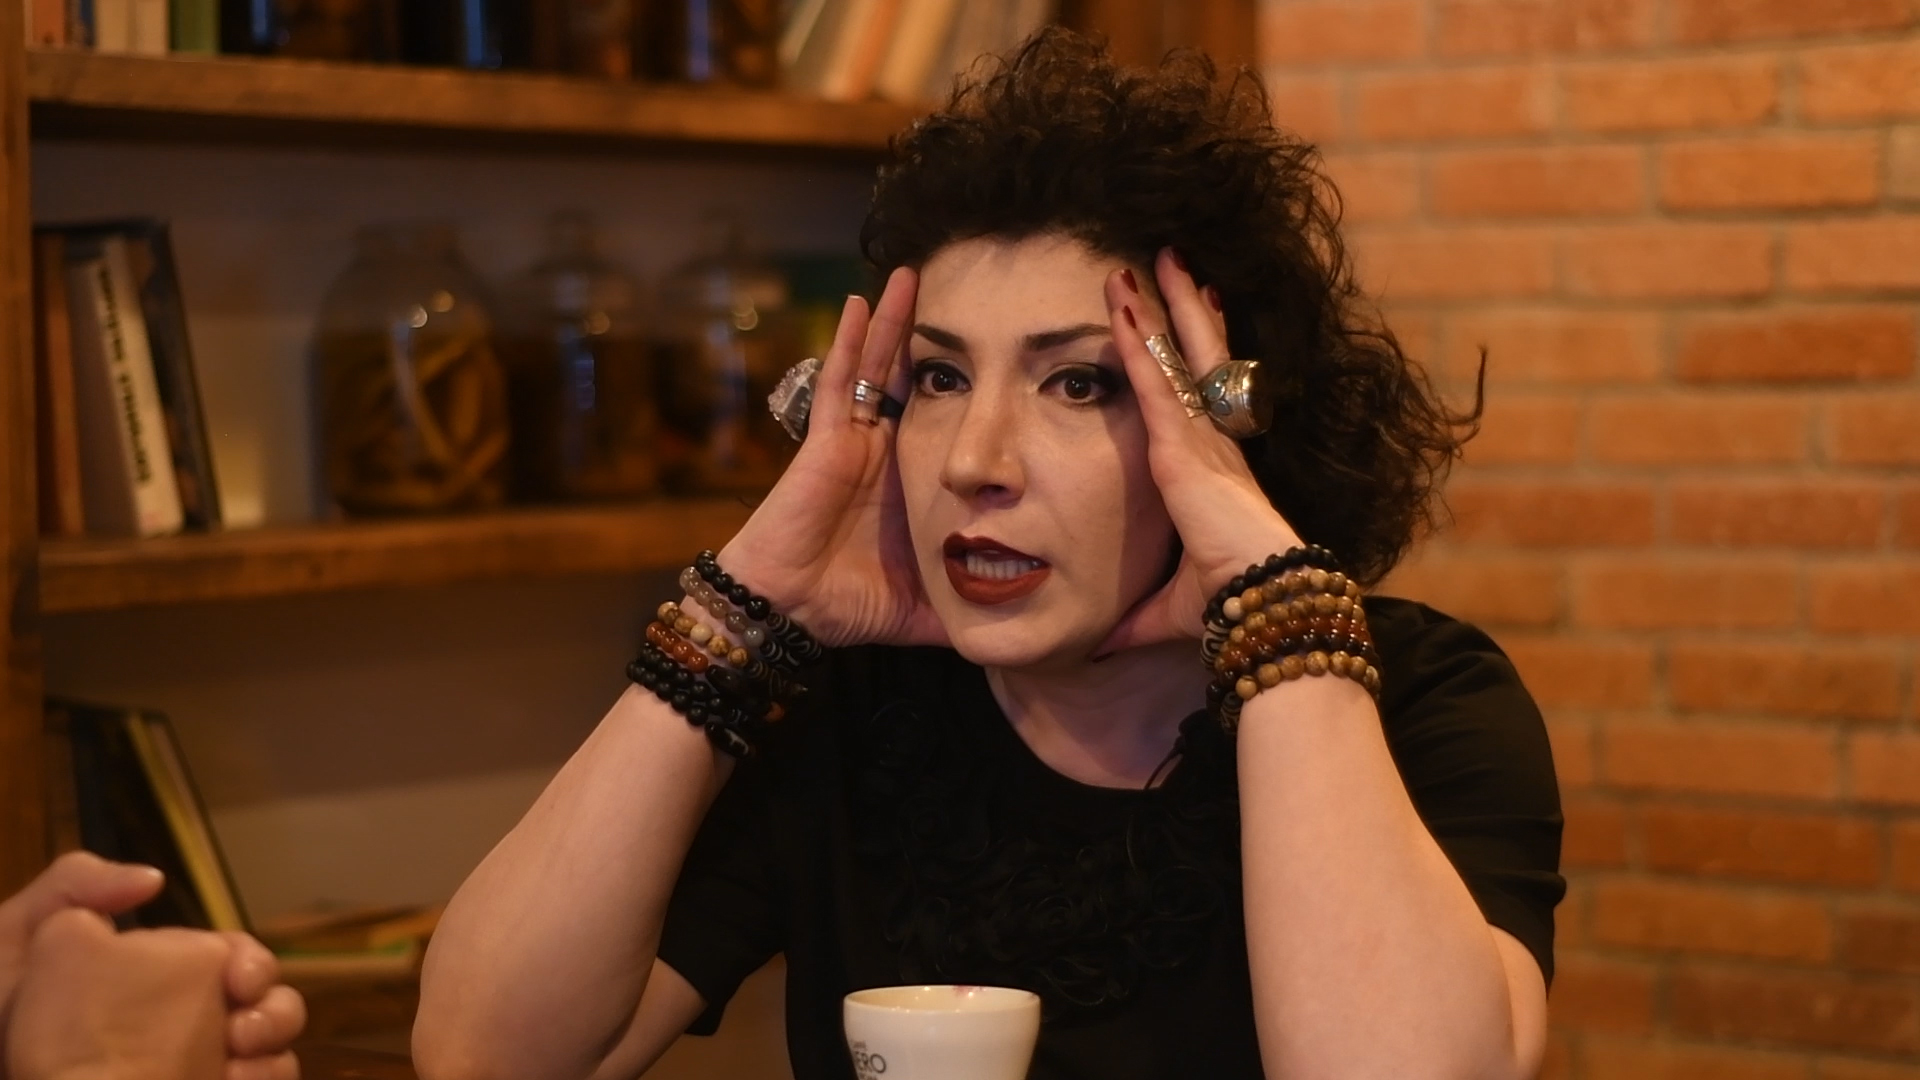 Barkalaya0 #TalkShot featured, Баркалая, Тина Баркалая